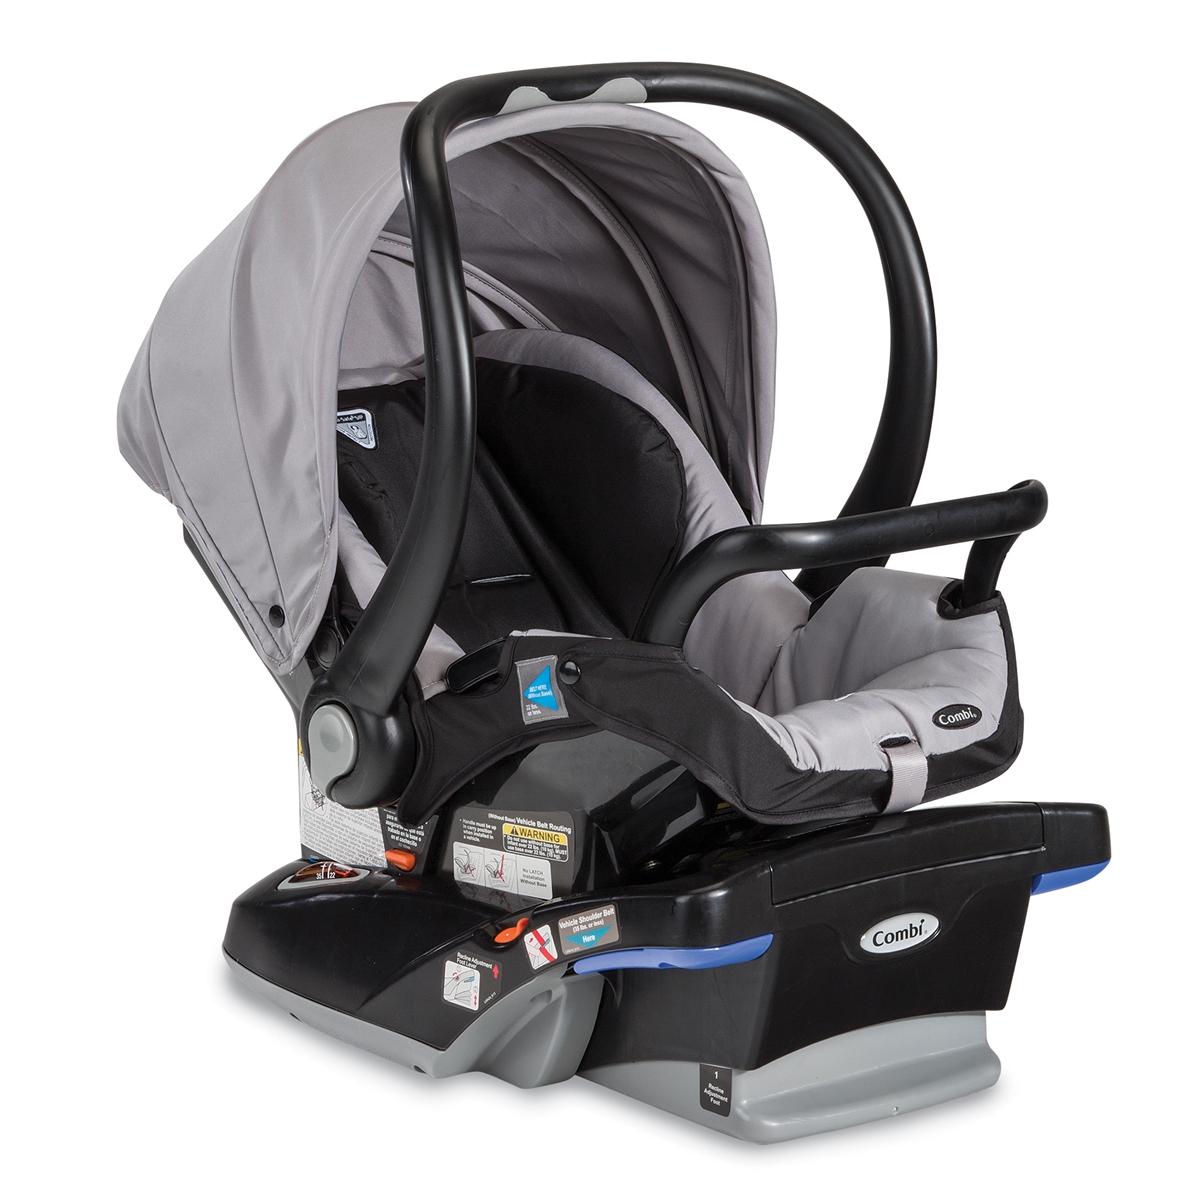 Shuttle Infant Car Seat